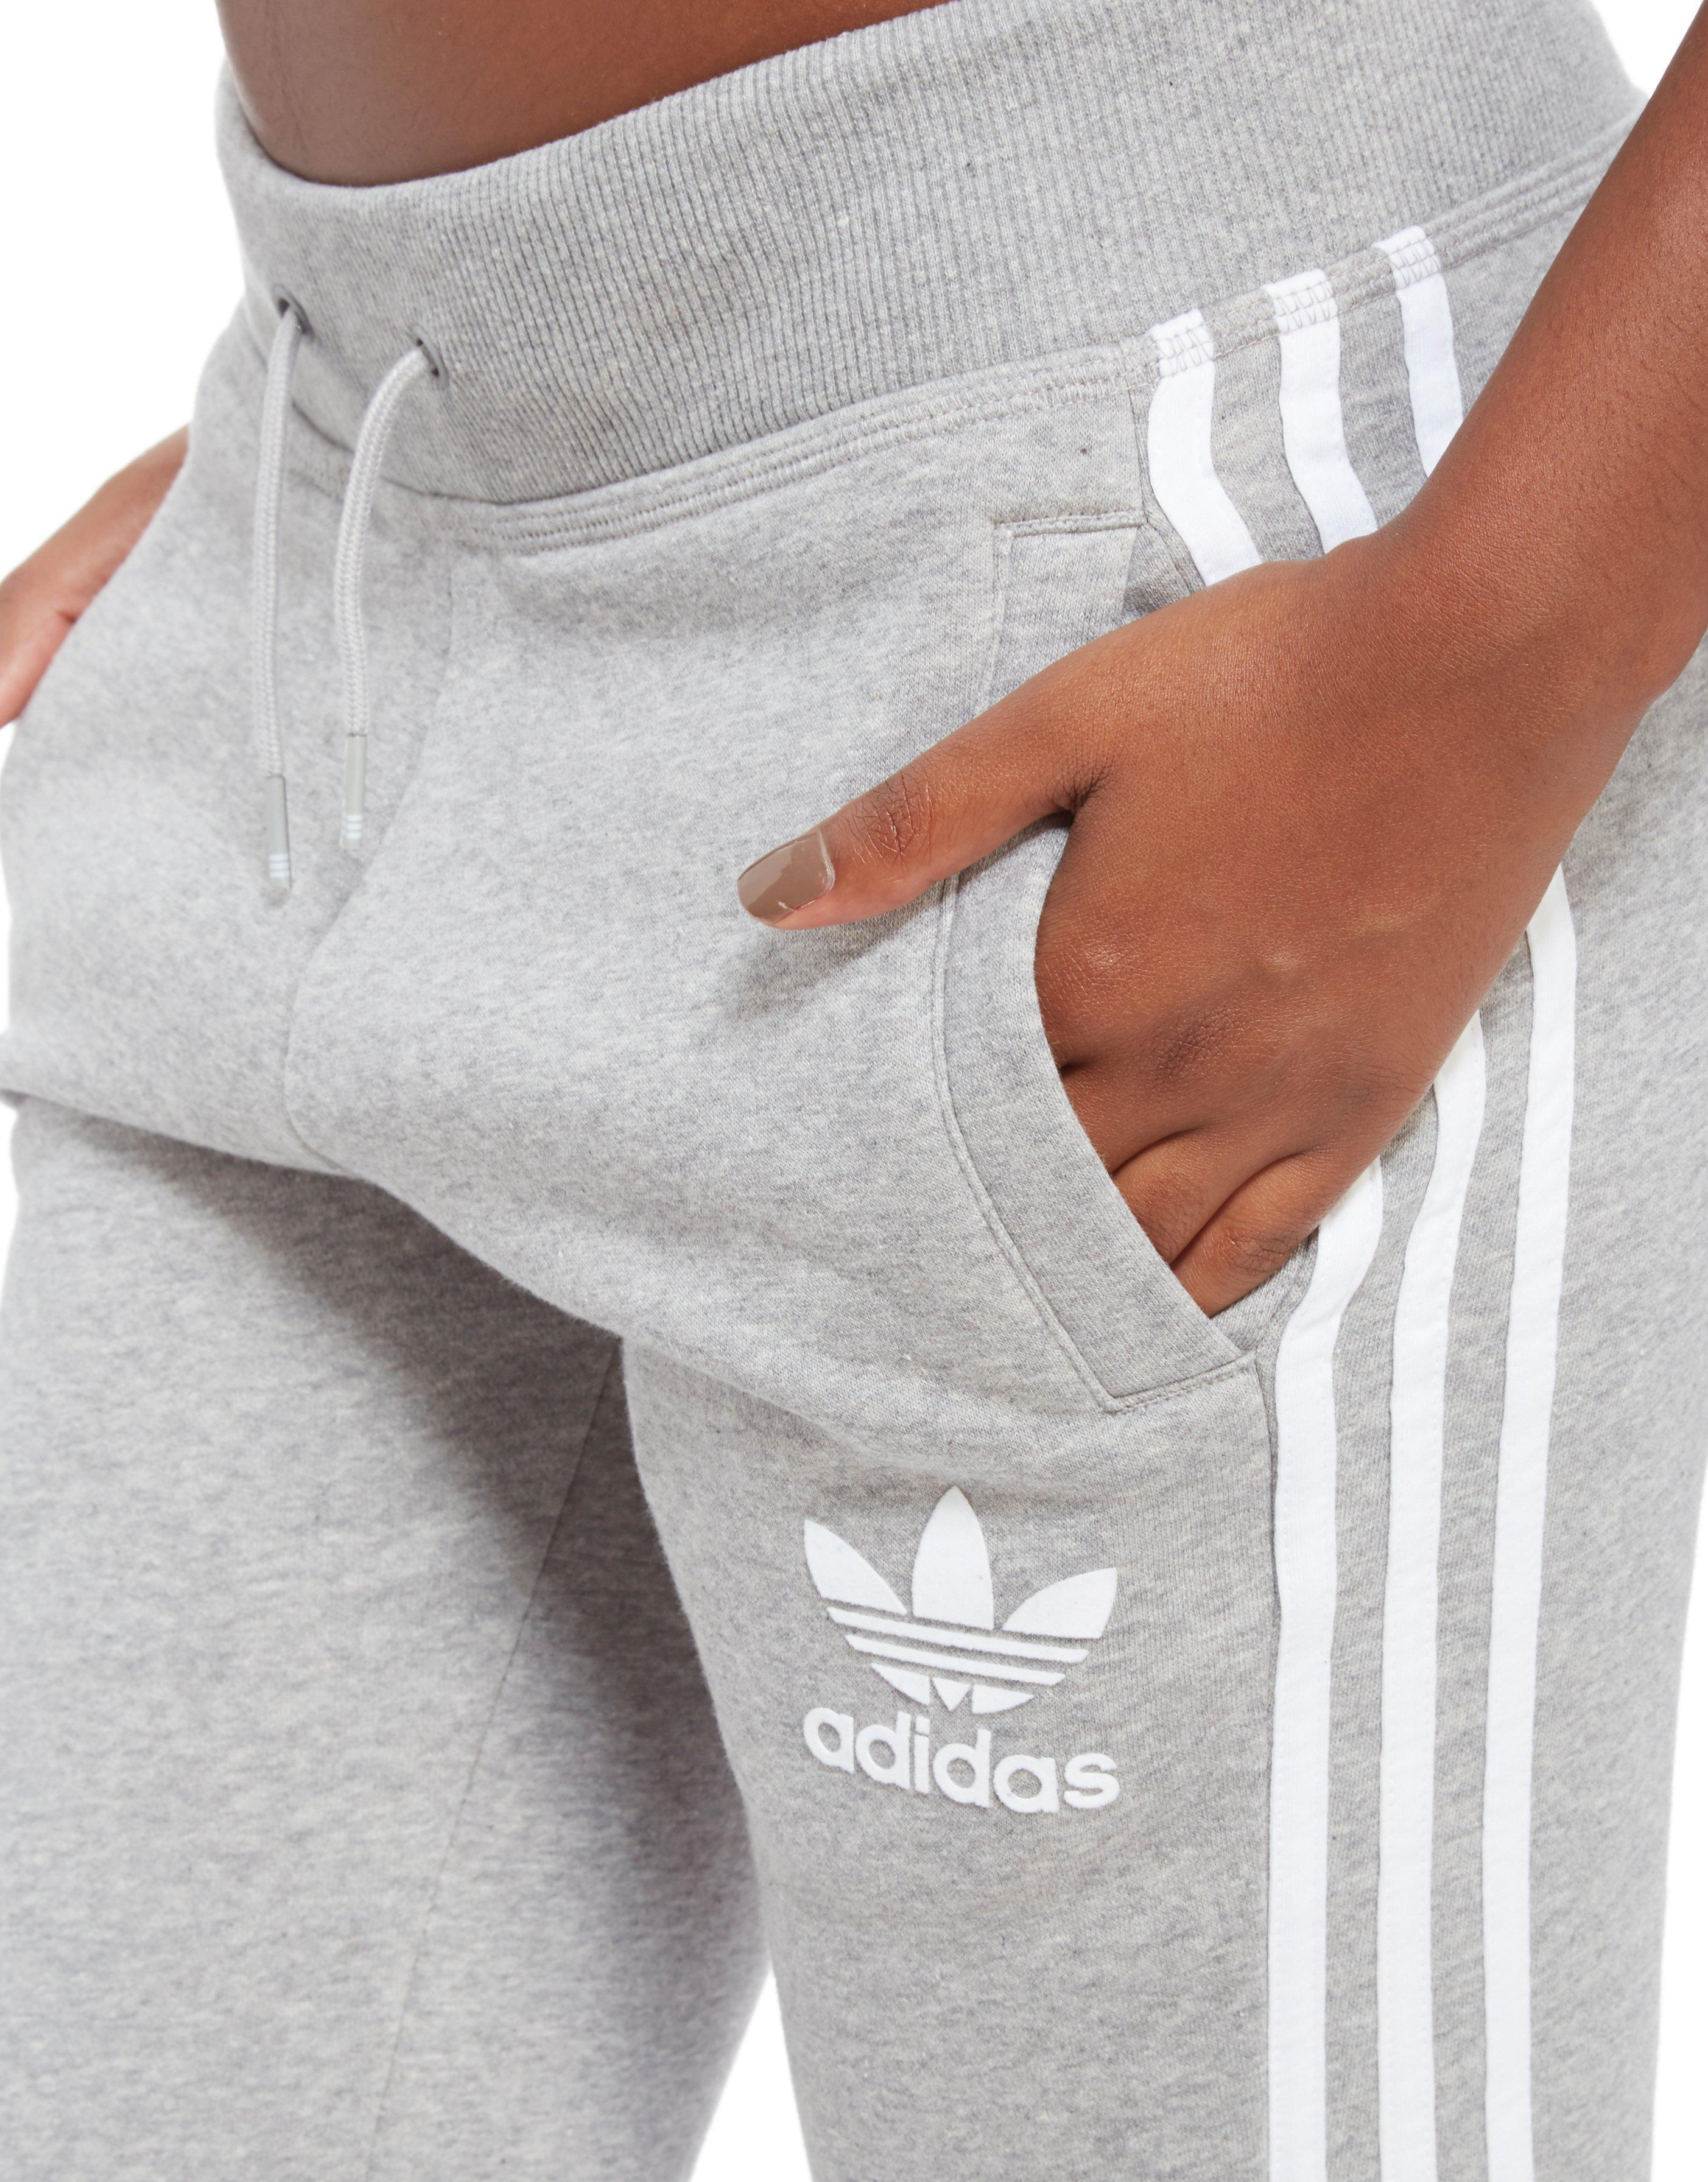 Lyst - adidas Originals California Tracksuit Bottoms in Gray 1e3bdb31dc